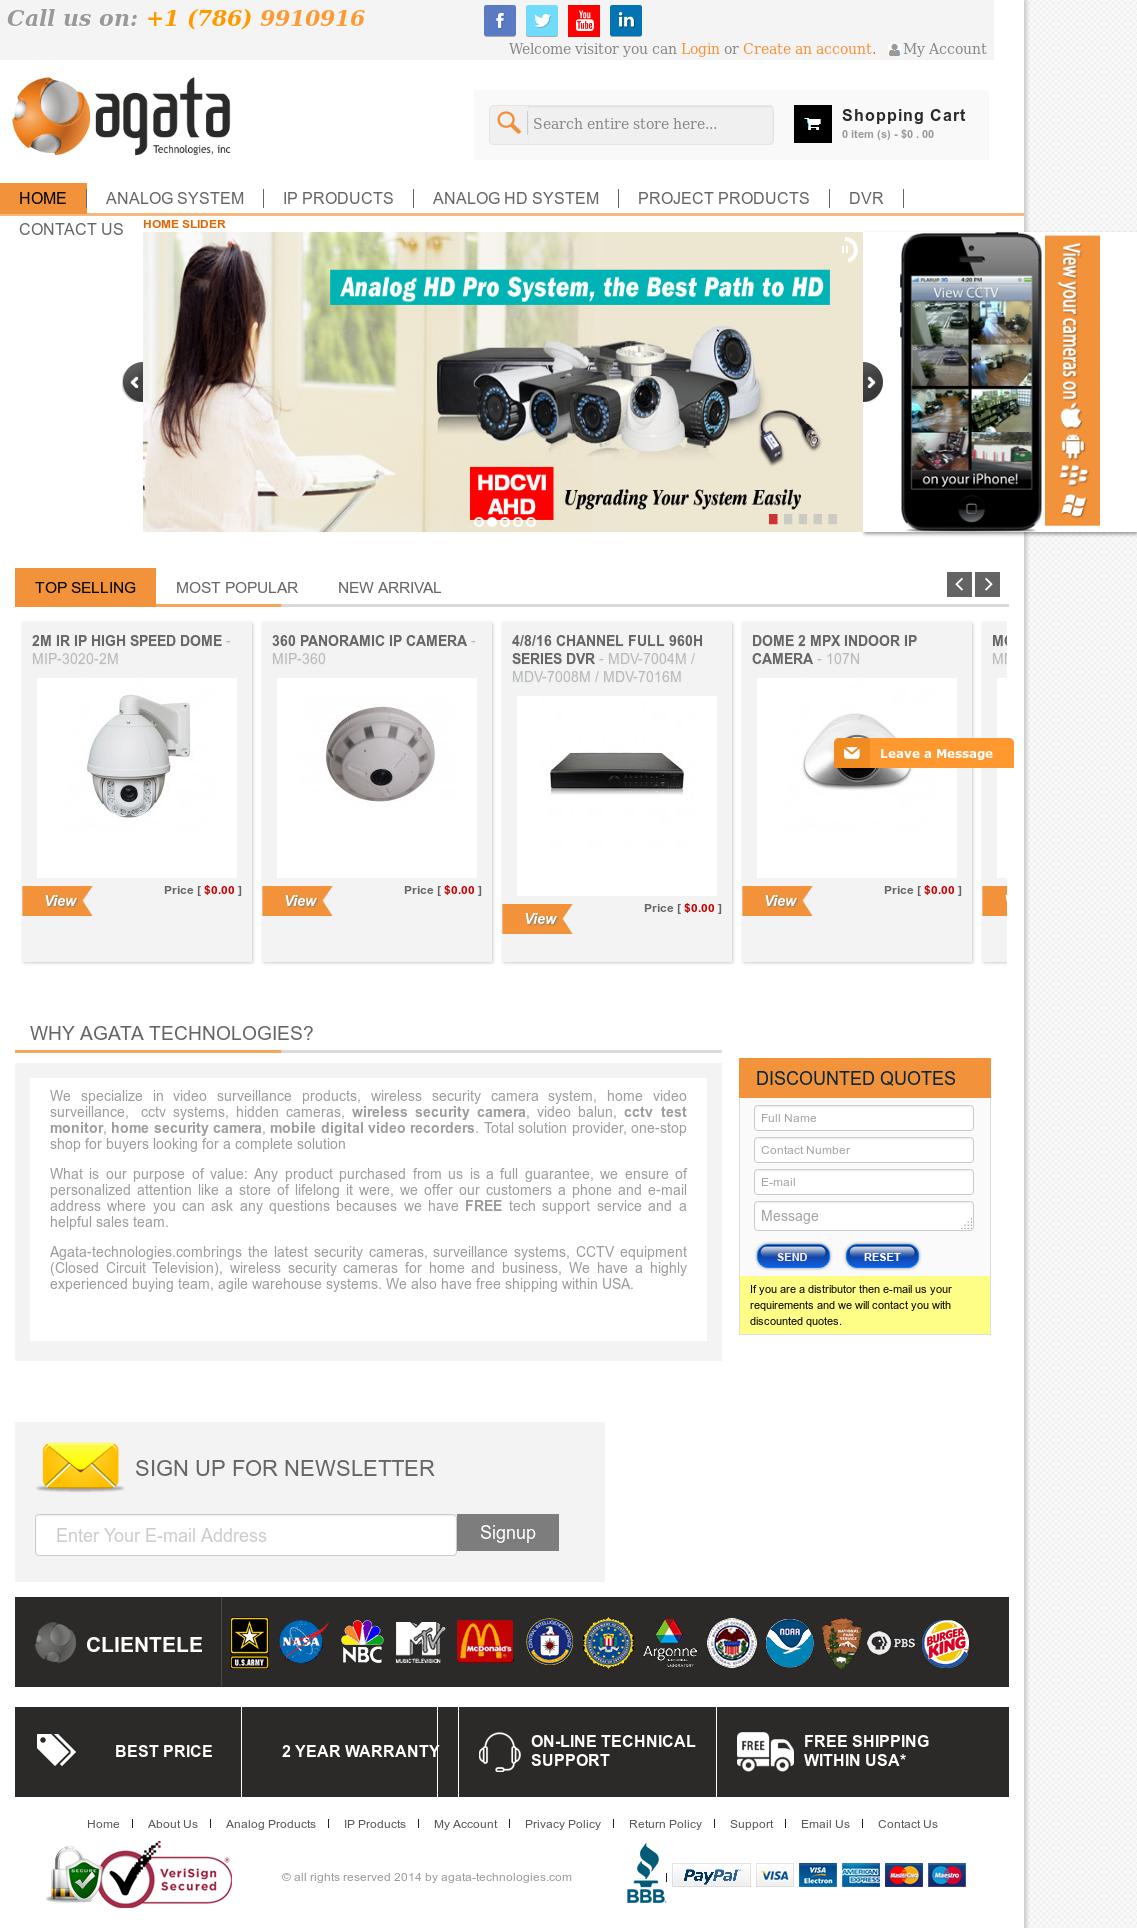 Wireless Security Cameras, Home Security Camera Kits, Agata